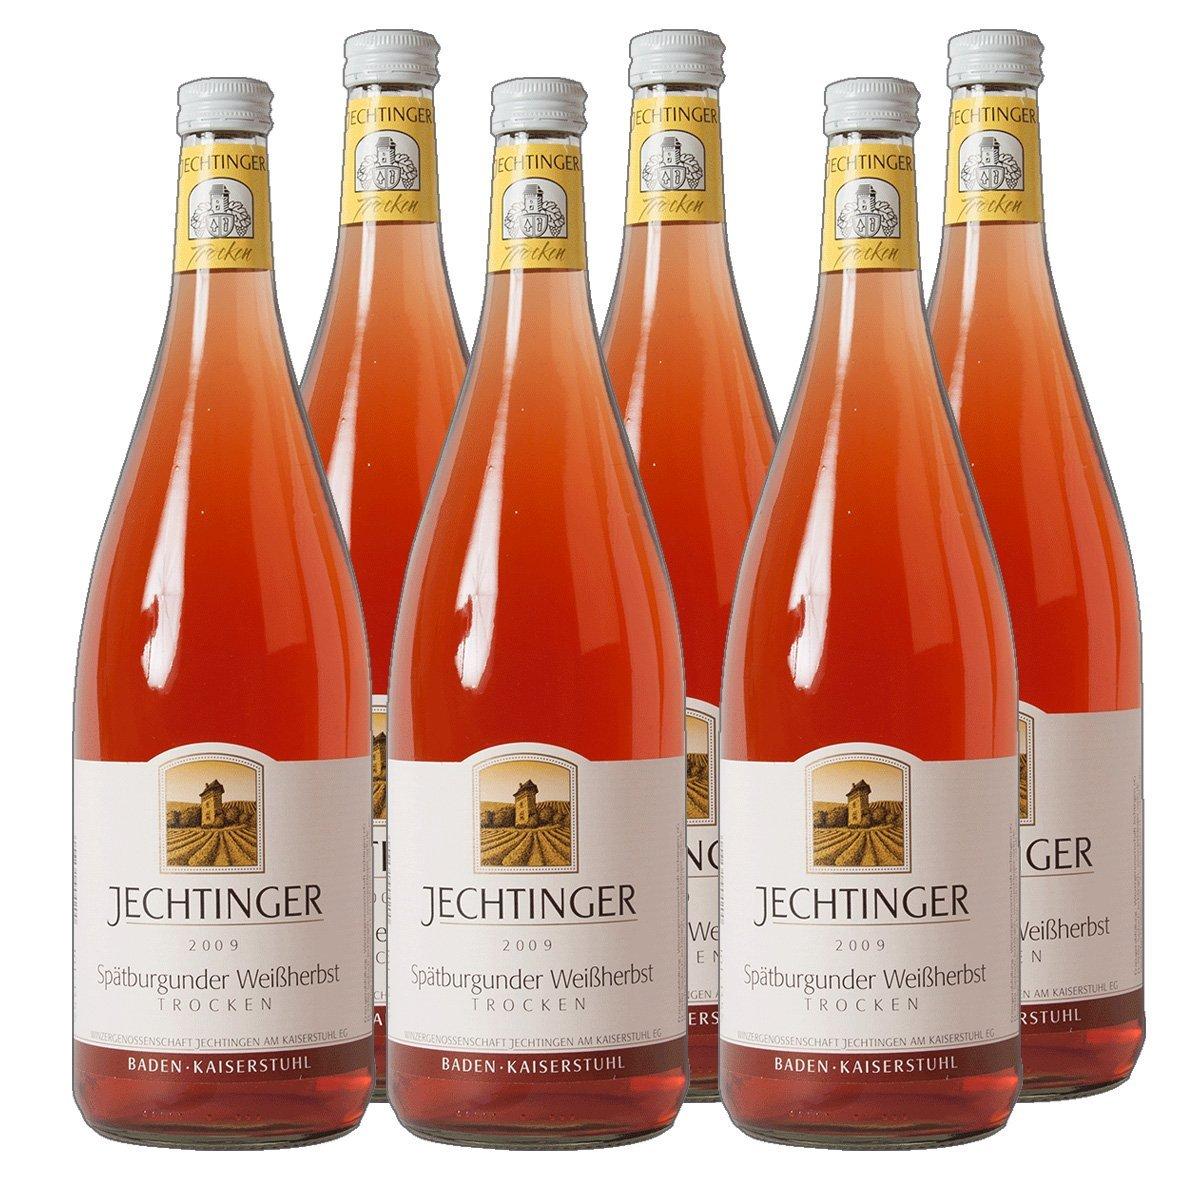 Jechtinger-Sptburgunder-Weiherbst-Baden-Wrttemberg-Ros-Liter-2017-halbtrocken-6x-1-l